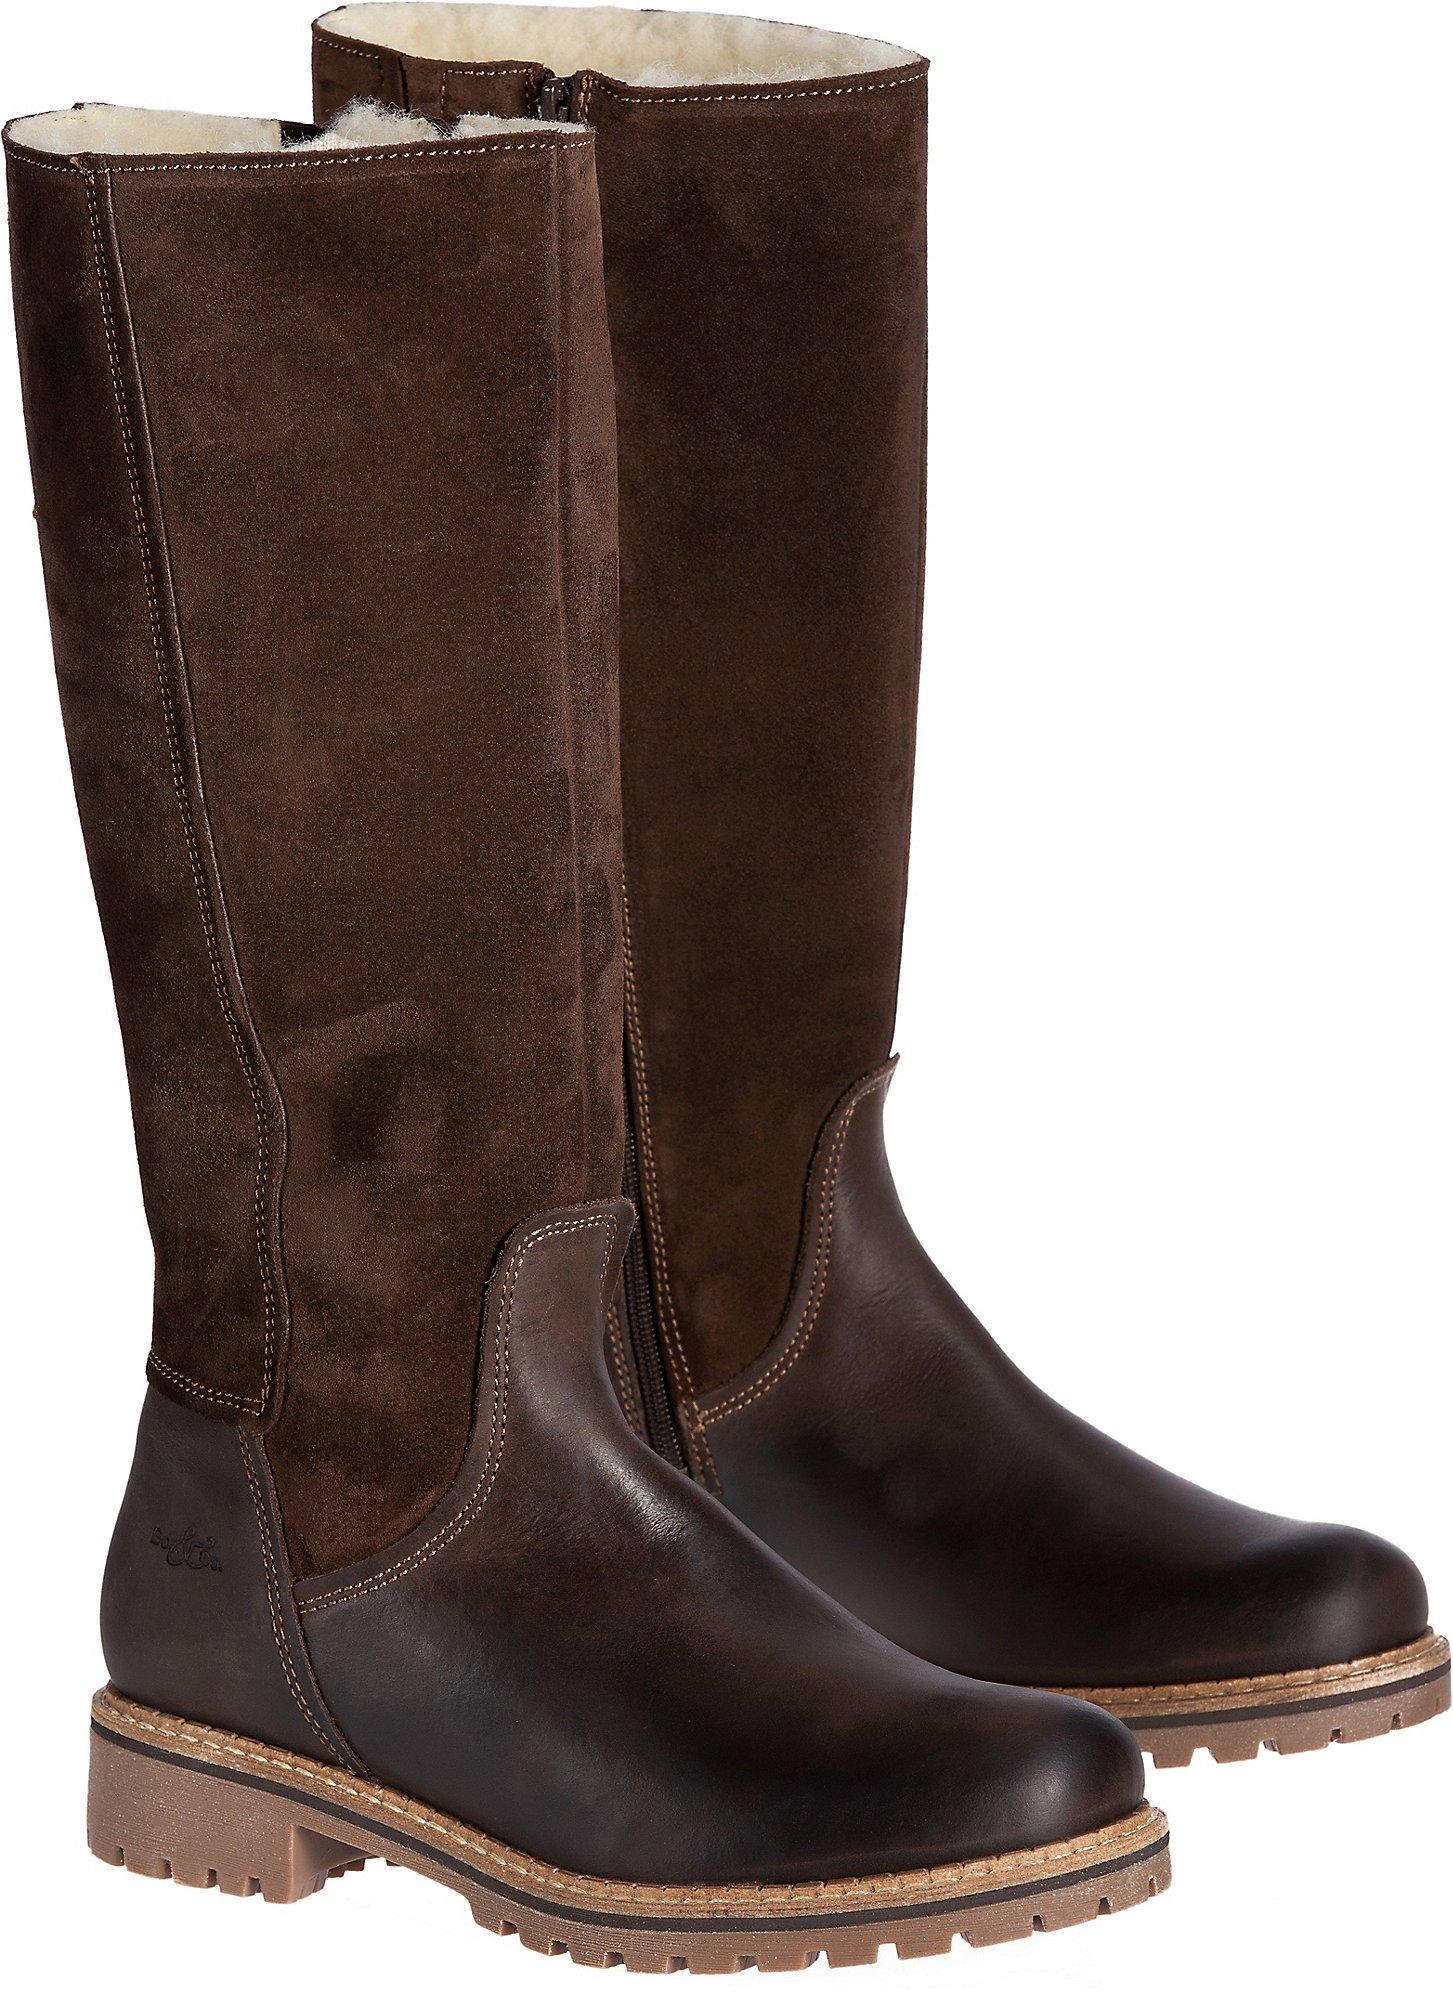 Women's Bos & Co Hudson Shearling-Lined Waterproof Leather Boots, DARK BROWN/COFFEE, Size EU40